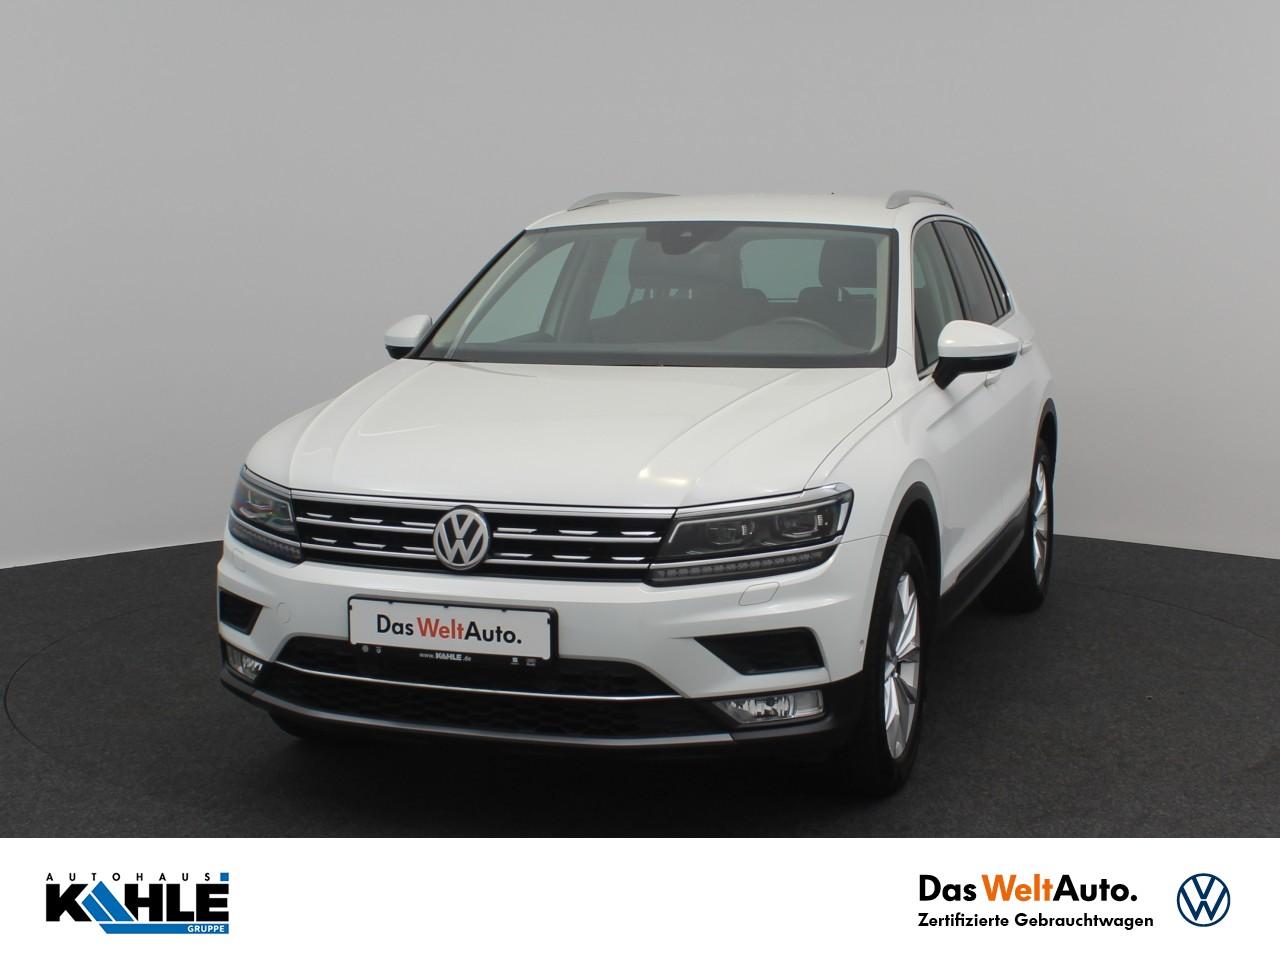 Volkswagen Tiguan 1.4 TSI BMT DSG 4-Motion Highline Navi LED AHK Active Info Klima, Jahr 2016, Benzin